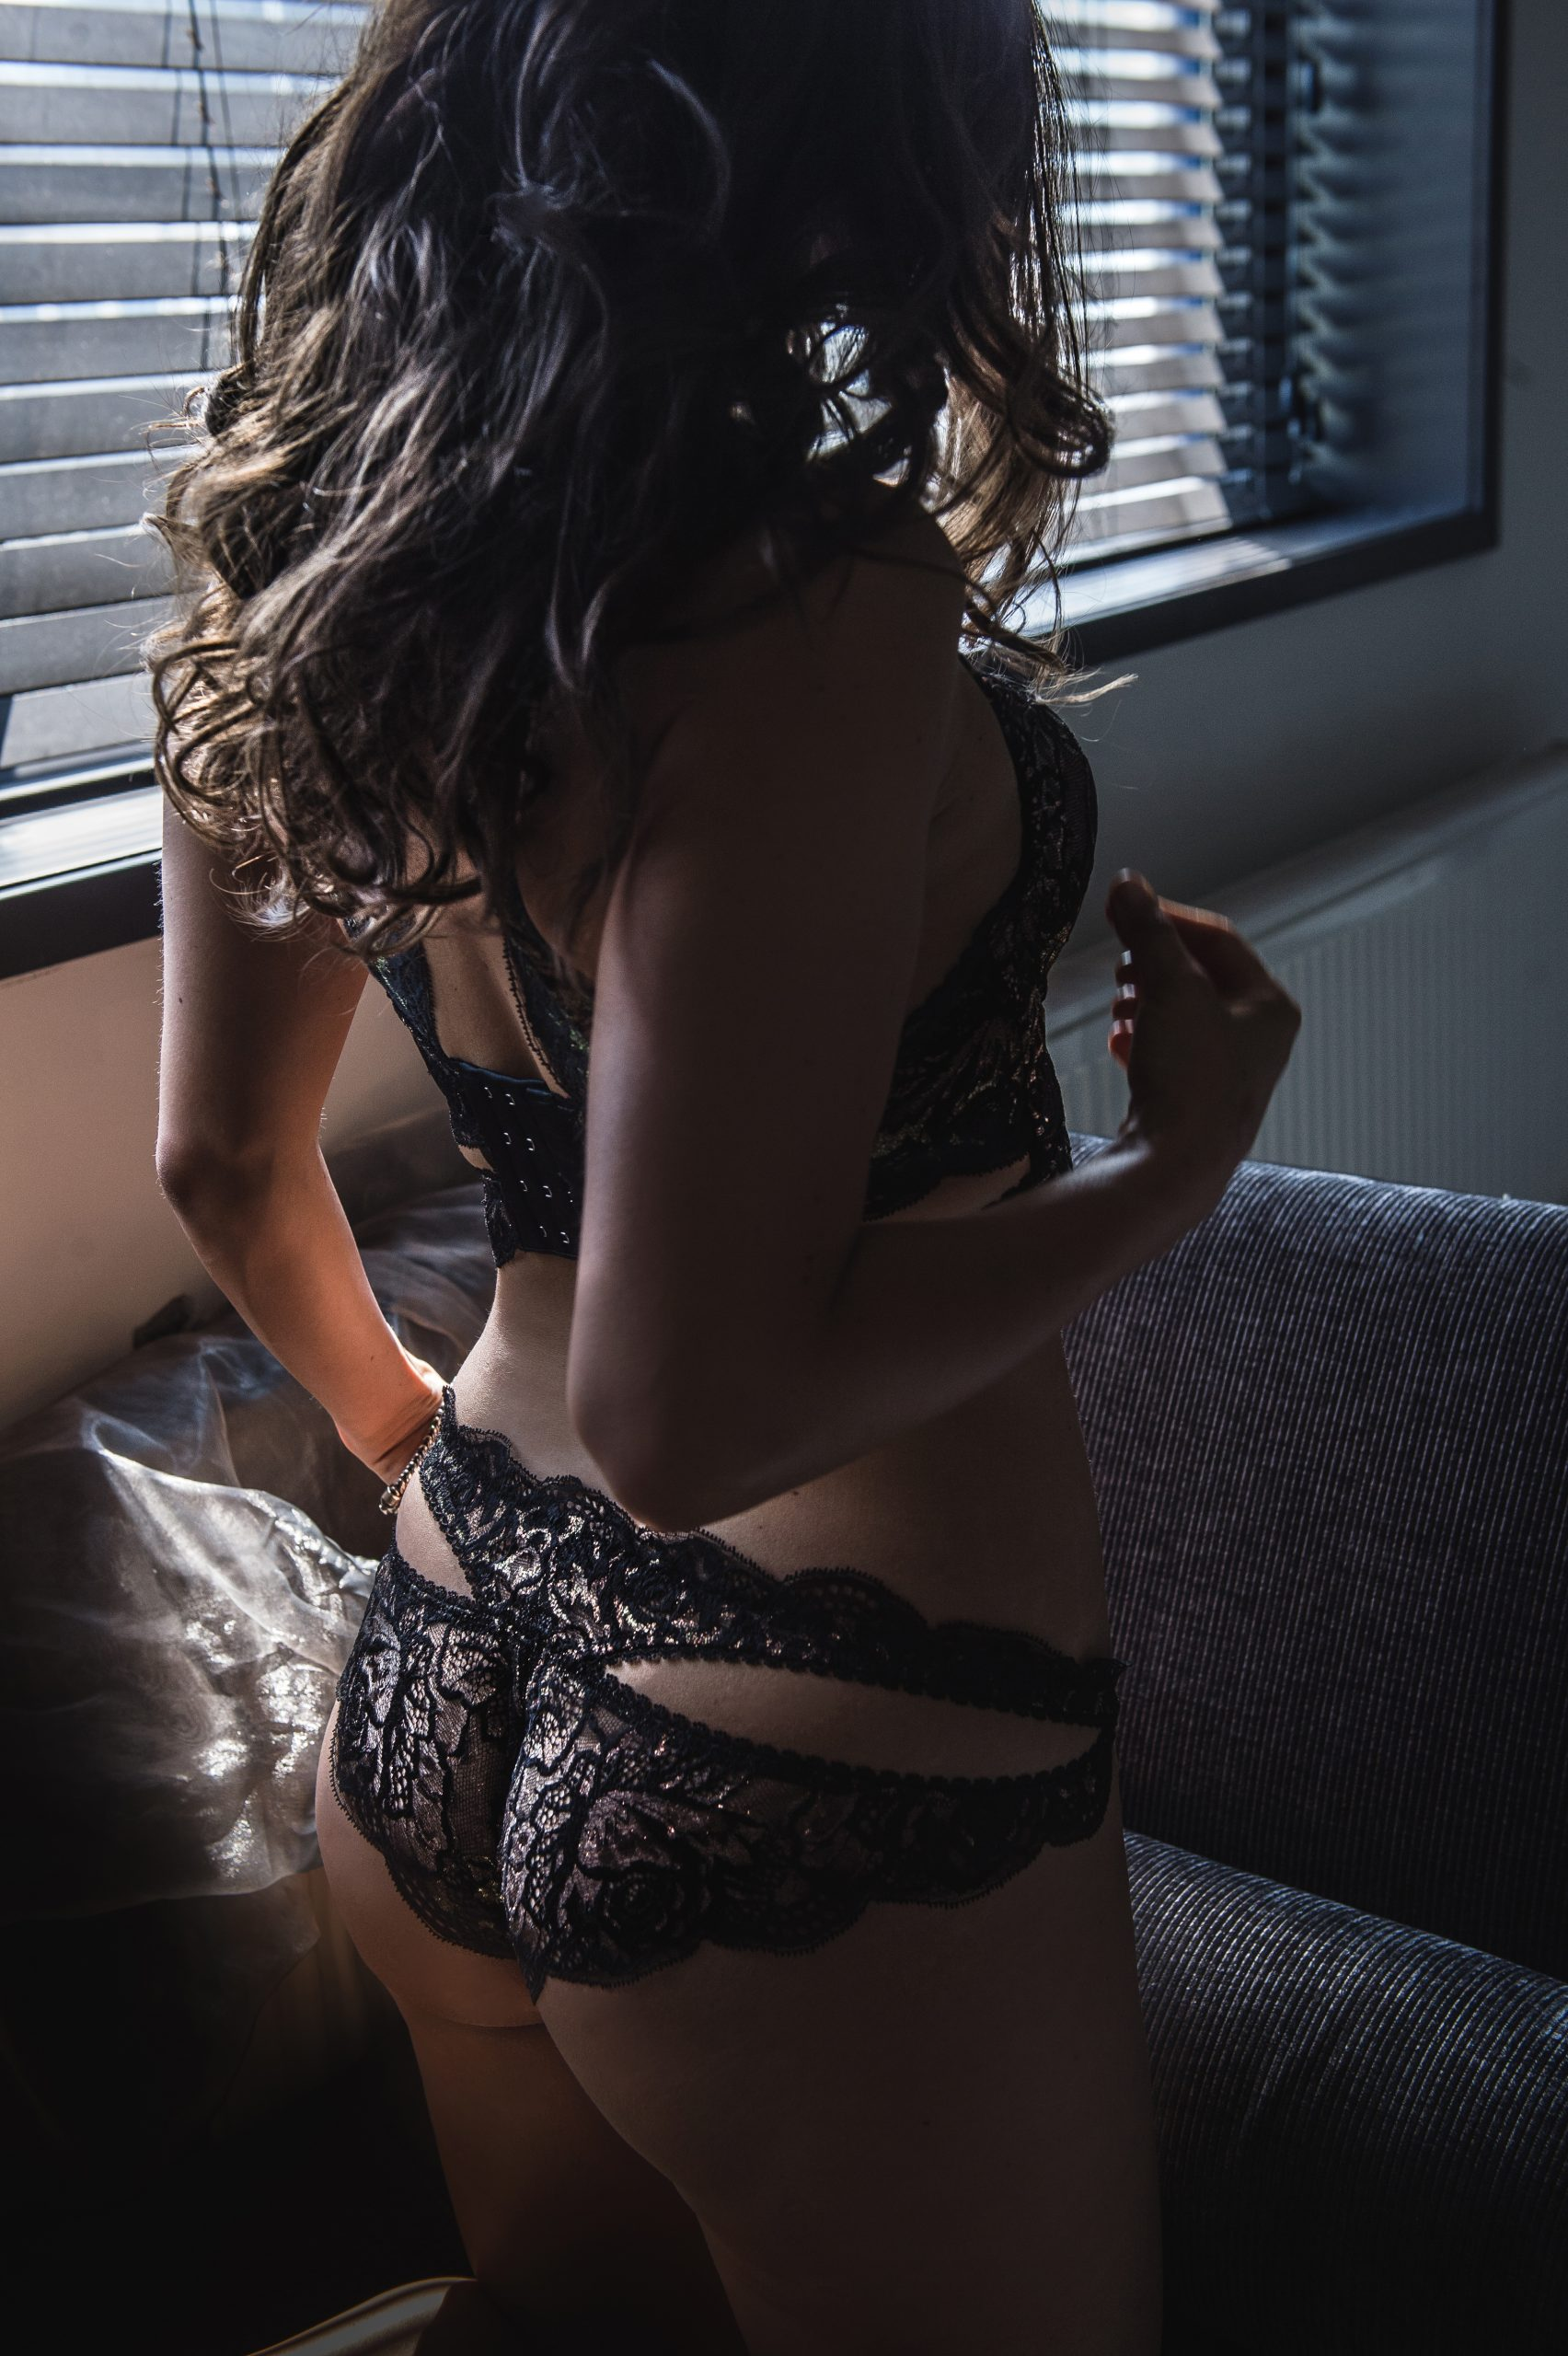 boudoirfotografie